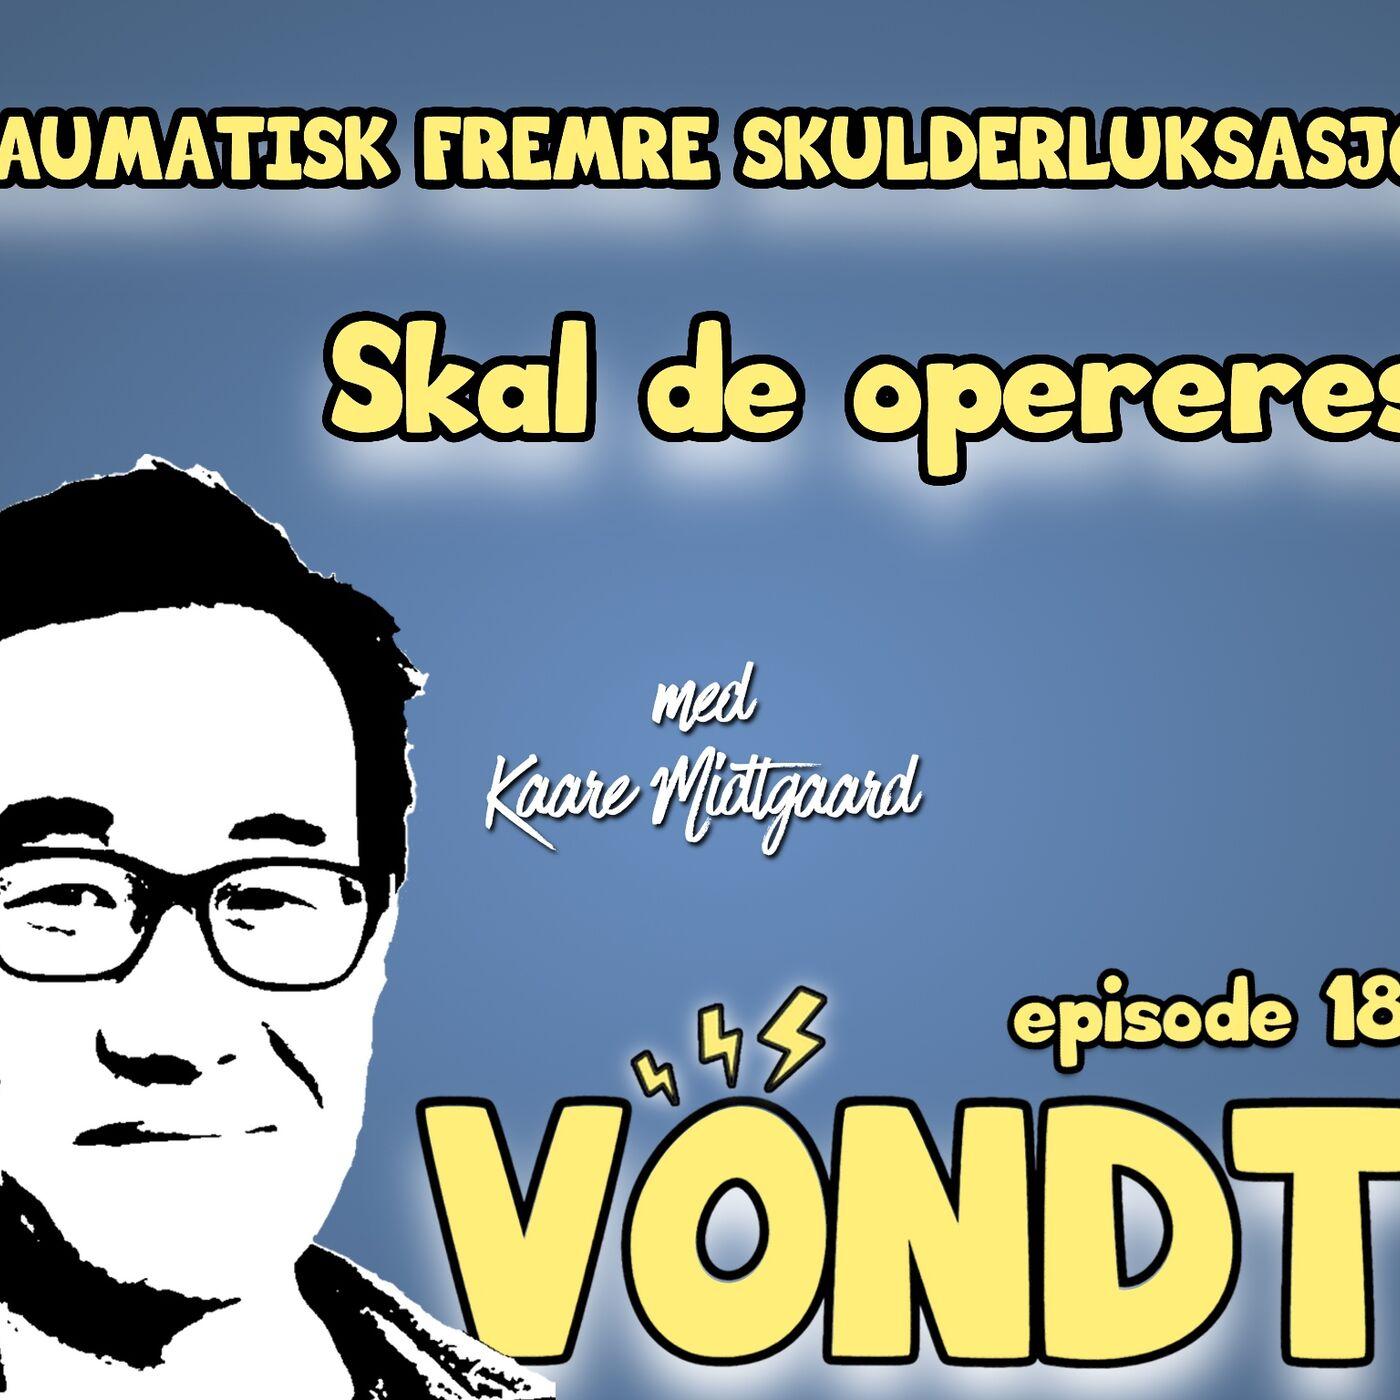 EP 18: Traumatisk skulderluksasjon m/ Kaare Midtgaard